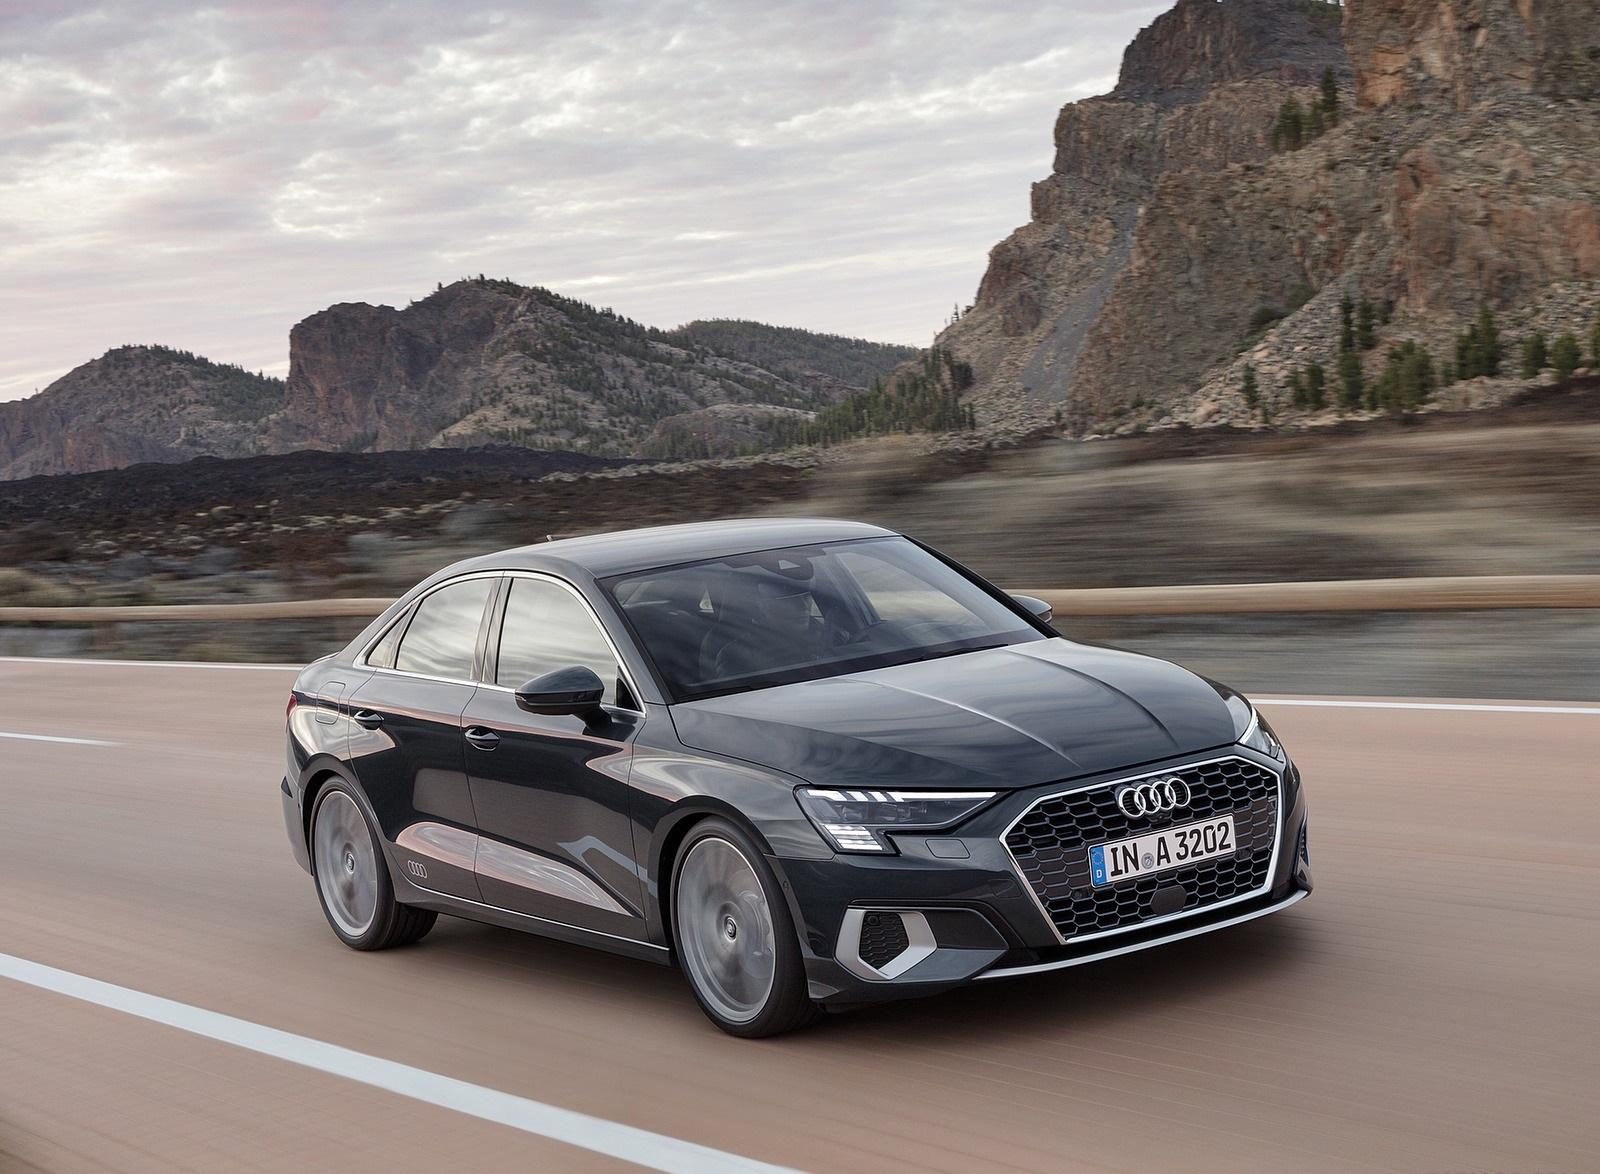 2021 Audi A3 Sedan Wallpapers 42 Hd Images Newcarcars